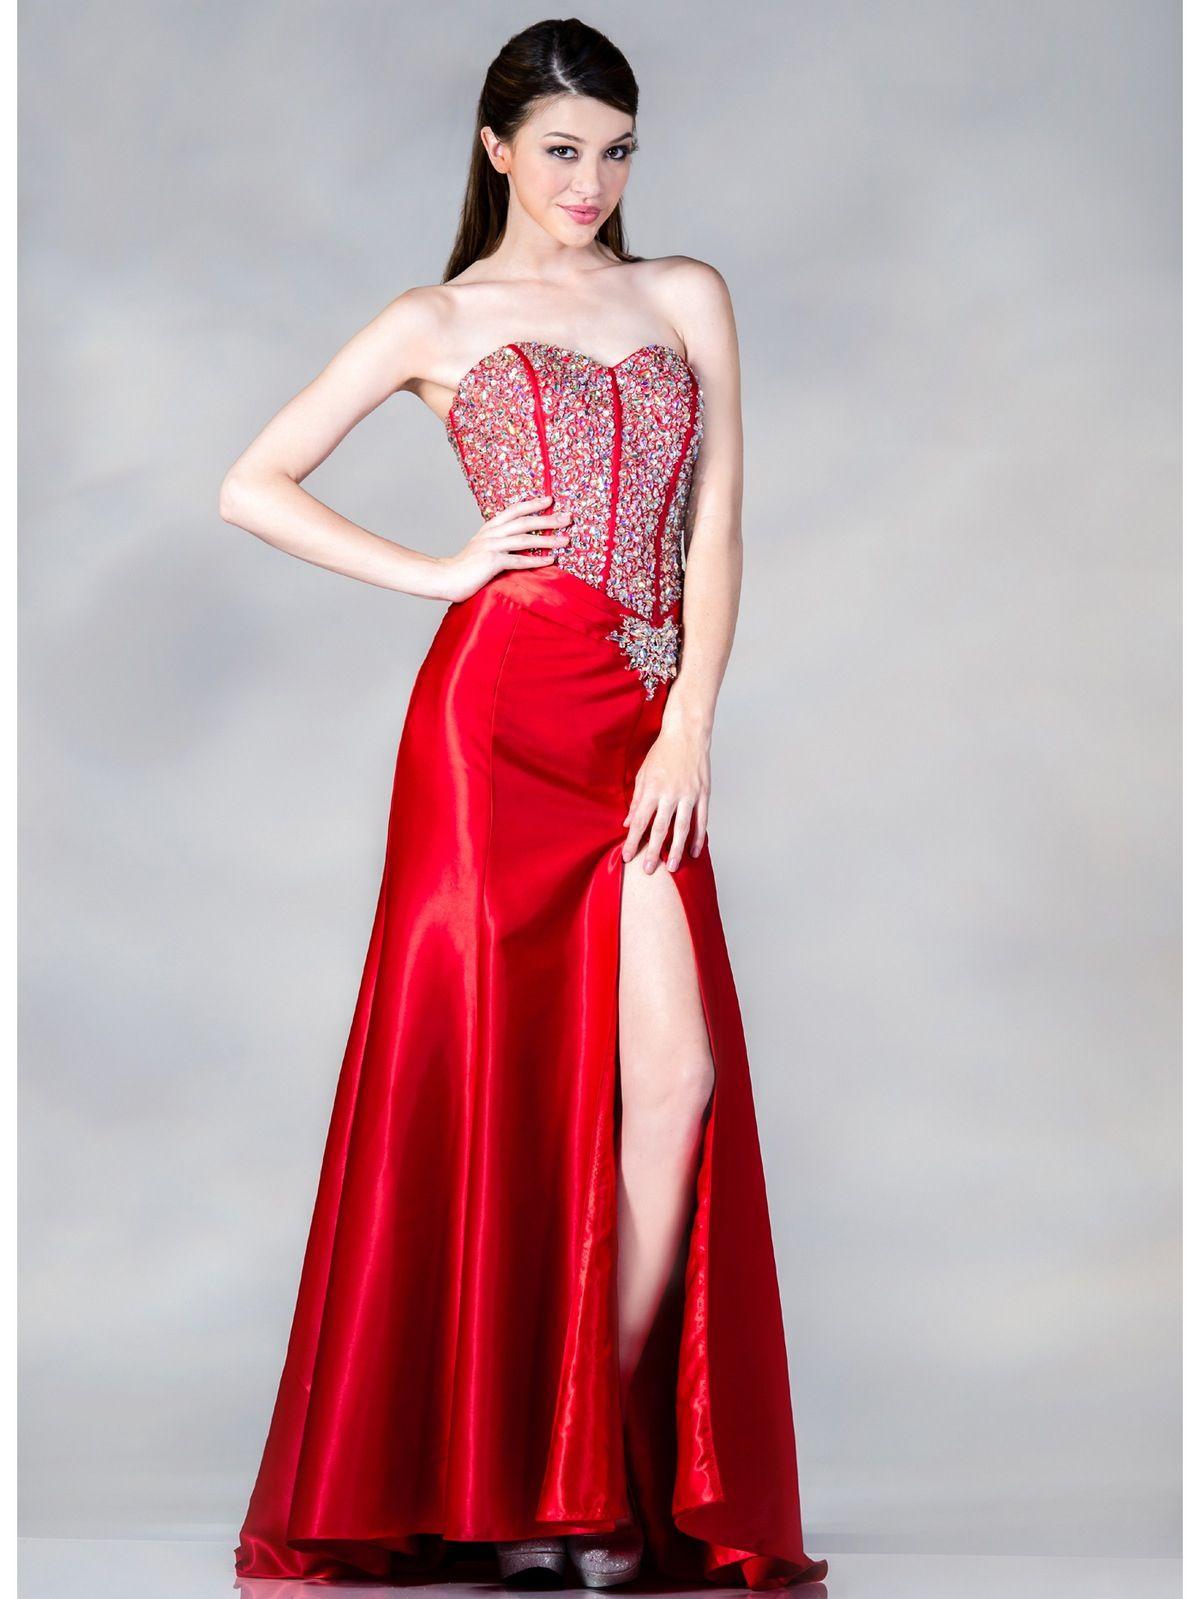 Prom corset dress red